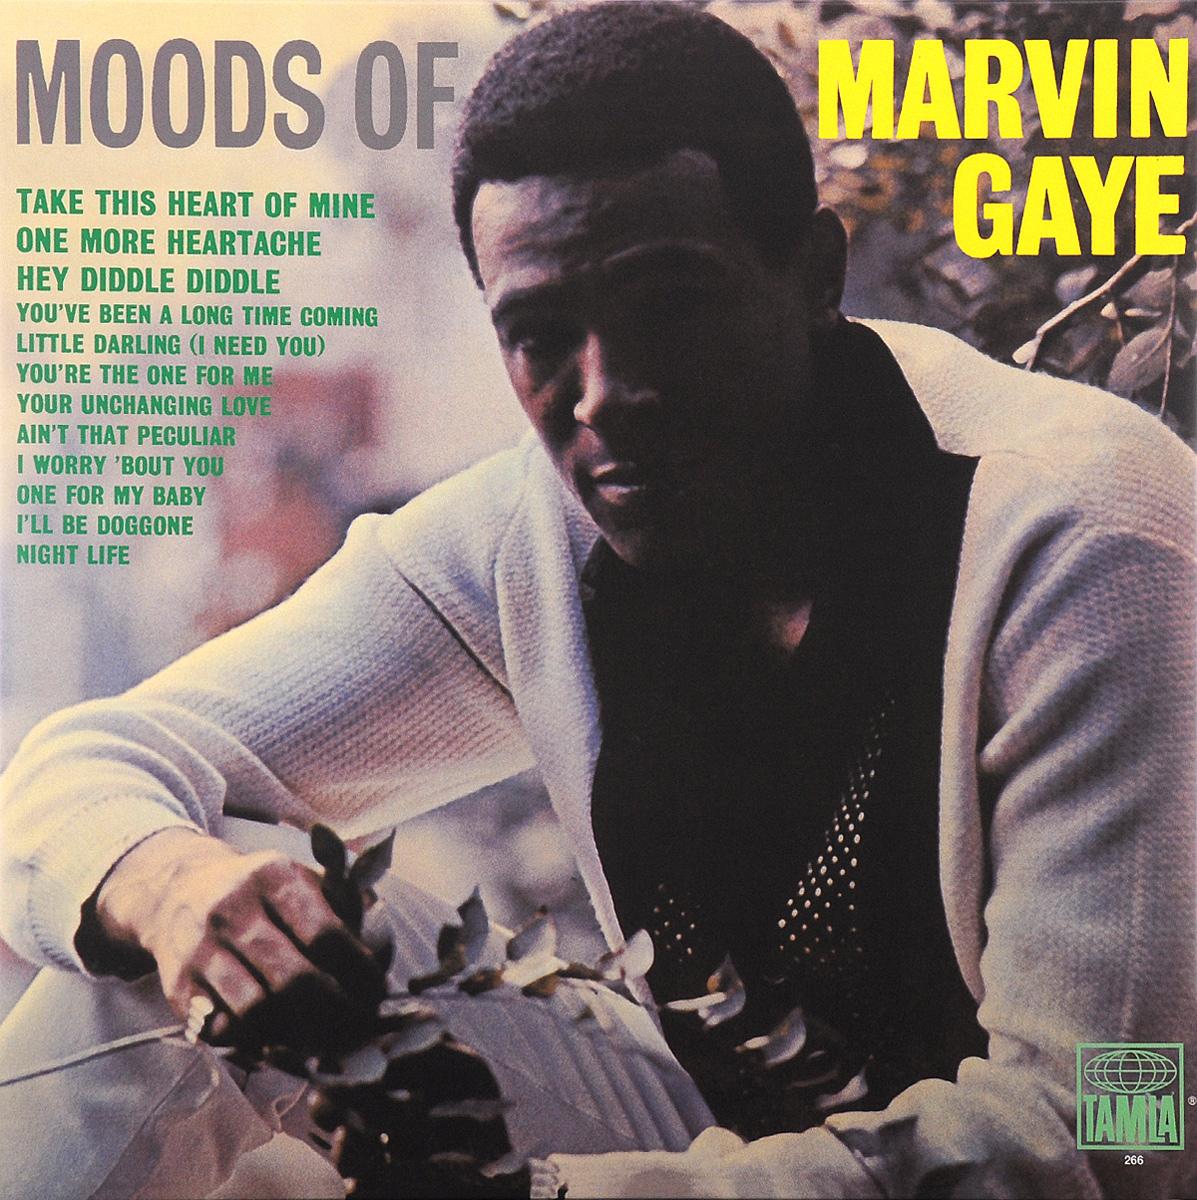 Марвин Гэй Marvin Gaye. Moods Of Marvin Gaye (LP) marvin gaye marvin gaye here my dear 2 lp